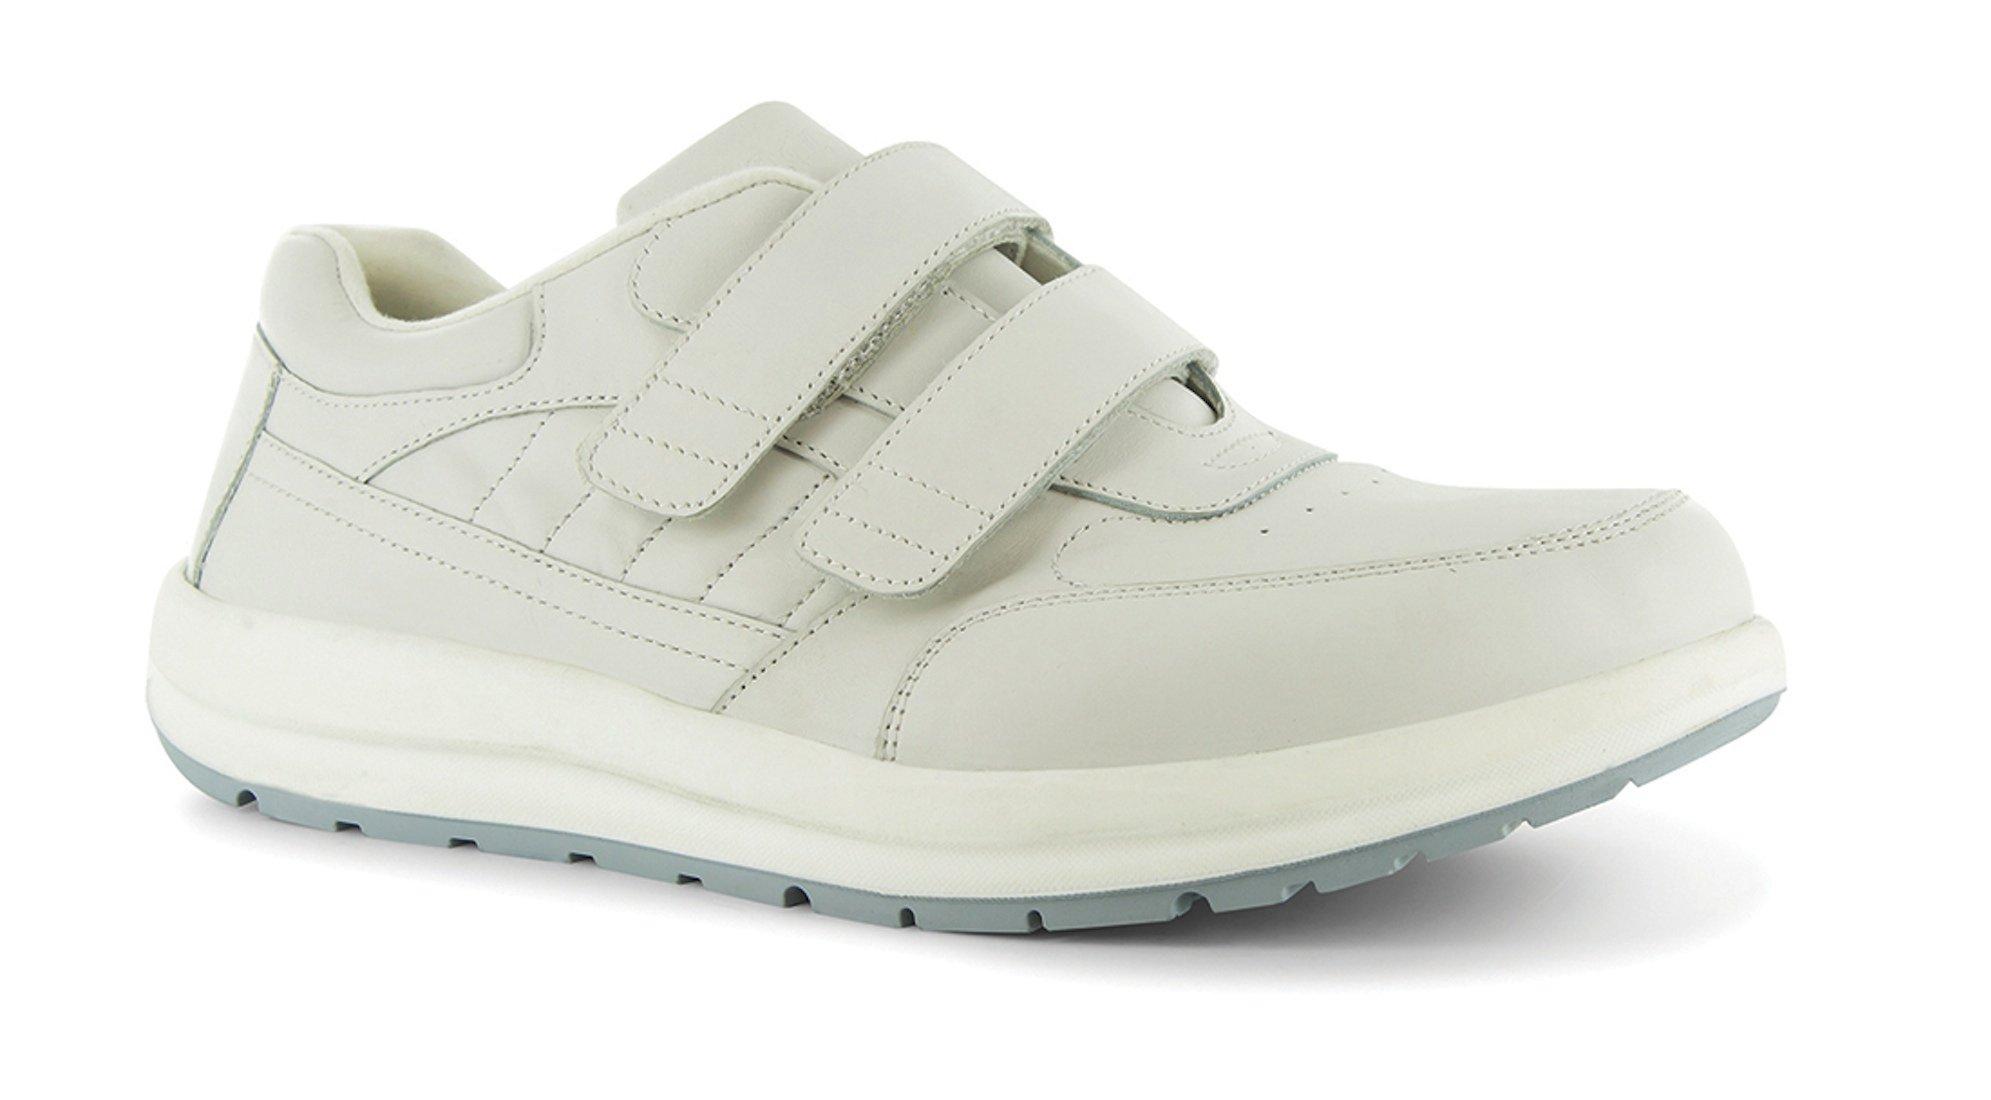 P W Minor Performance Walker Men's Therapeutic Casual Extra Depth Shoe: White 7 Medium (D) Velcro